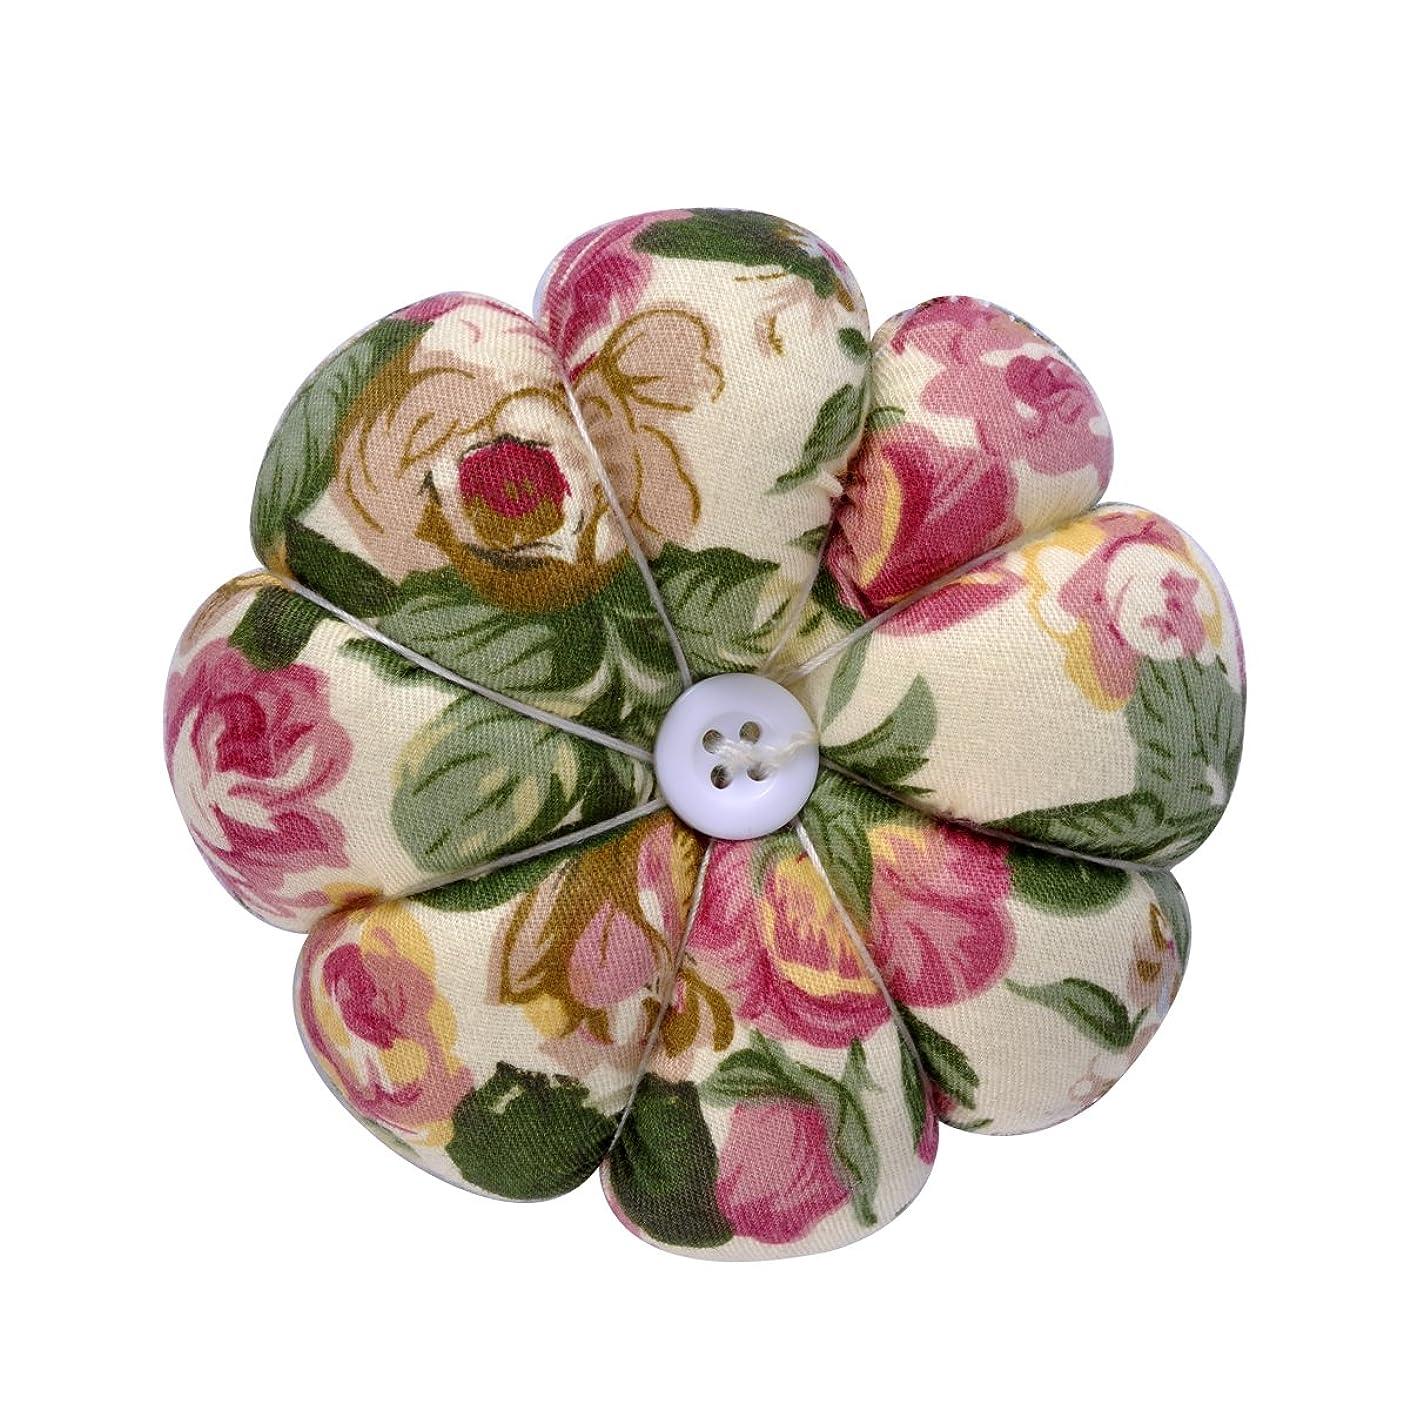 eZAKKA Pin Cushion Polka Pumpkin Wrist Pin Cushions Wearable Needle Pincushions for Sewing Quilting Pins Holder (Flowers)